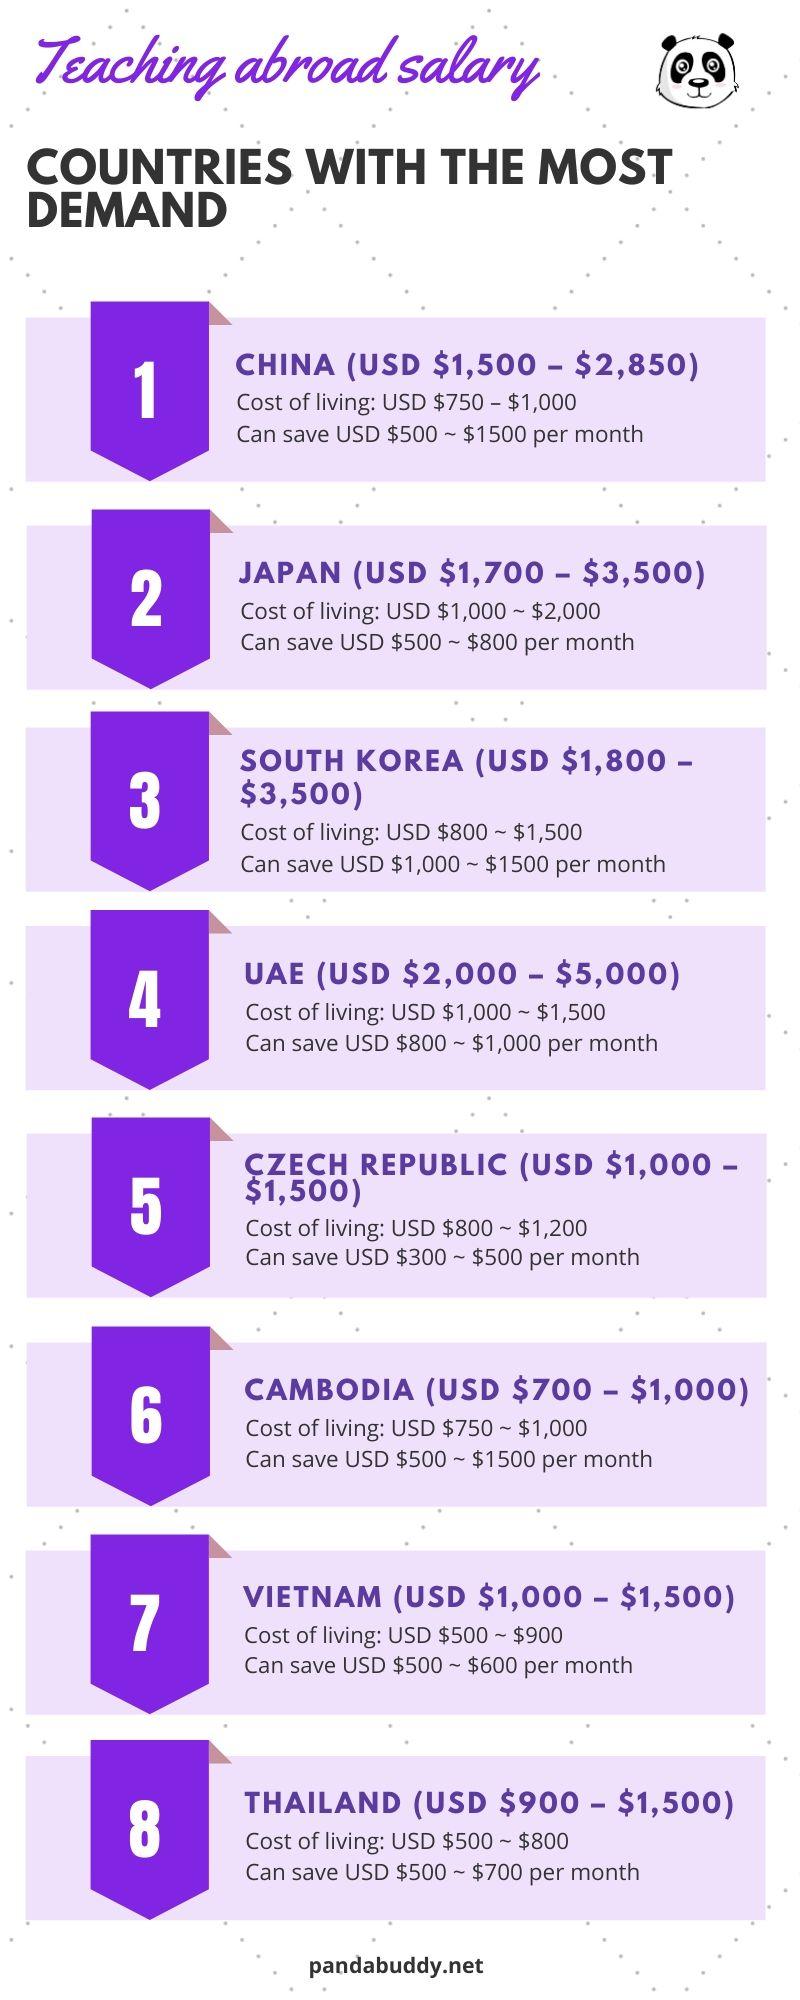 Teaching abroad salary, teaching english abroad salary, how much can you make teaching english abroad, teaching overseas salary